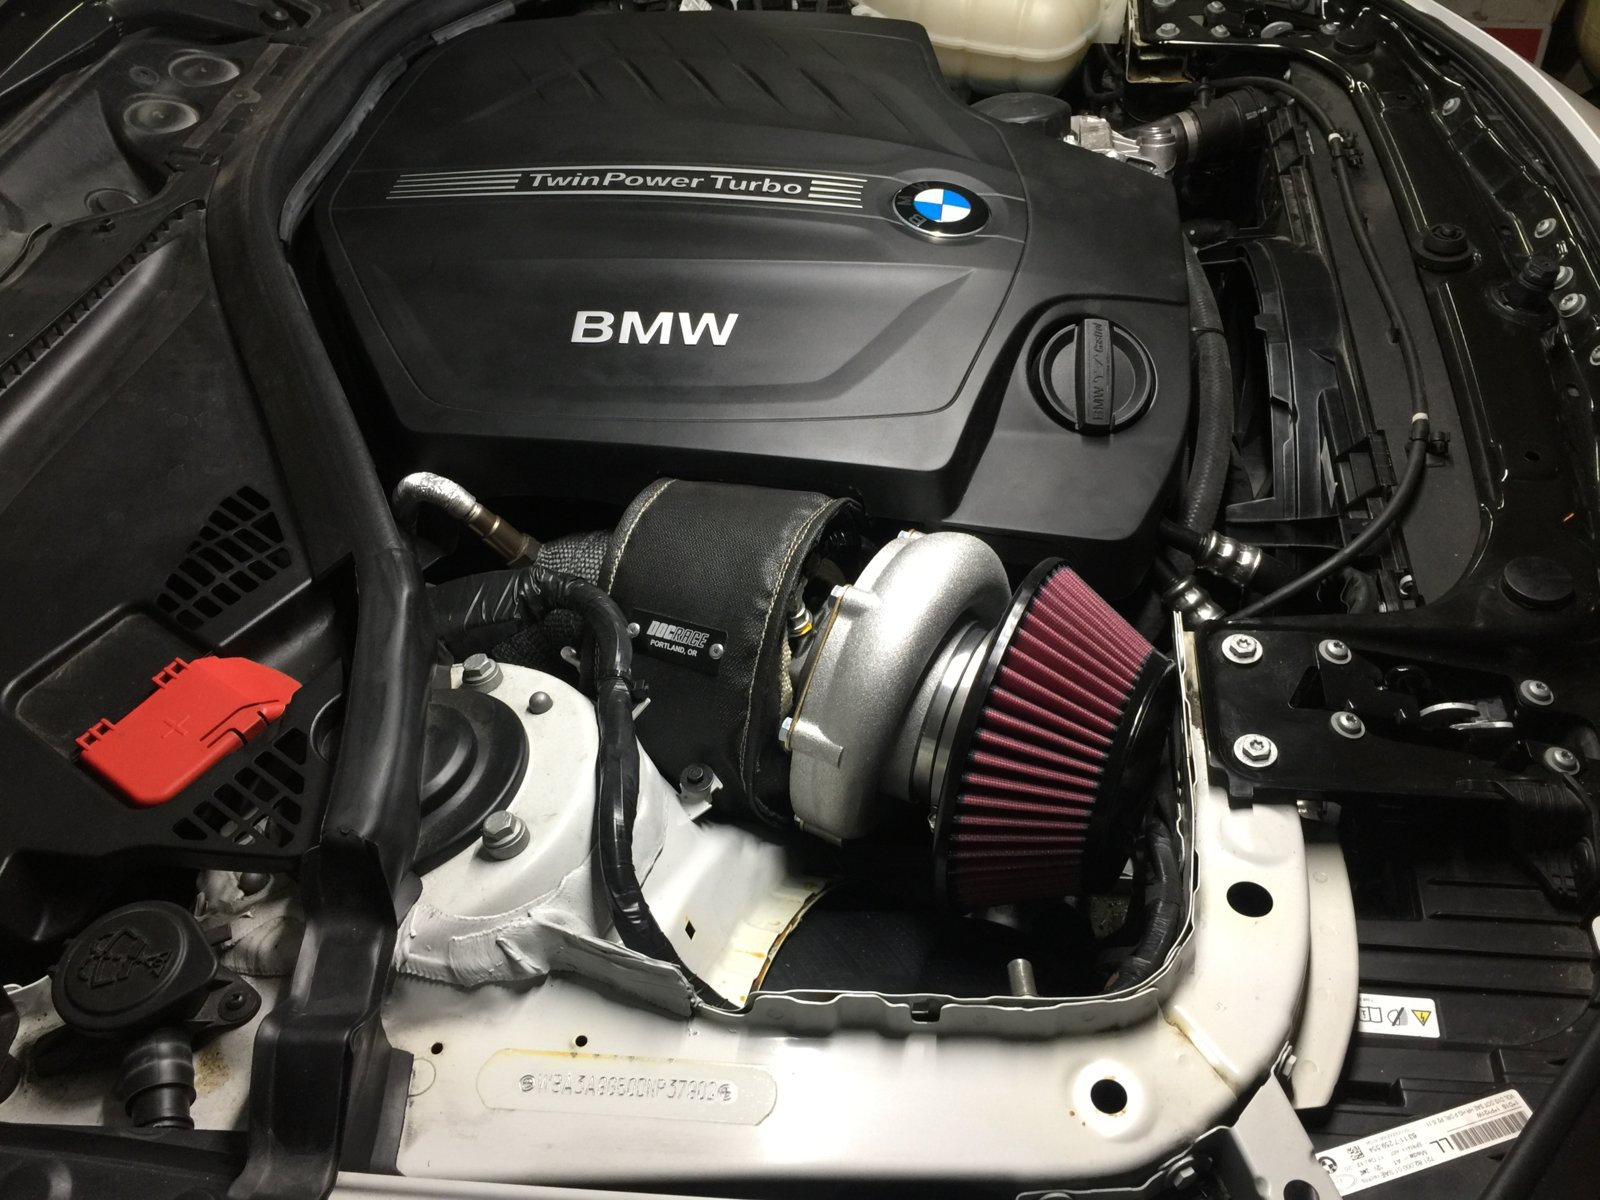 Development Of DOC Race F I Turbo Kit BMW Forums SpoolStreet - Bmw 335i turbos